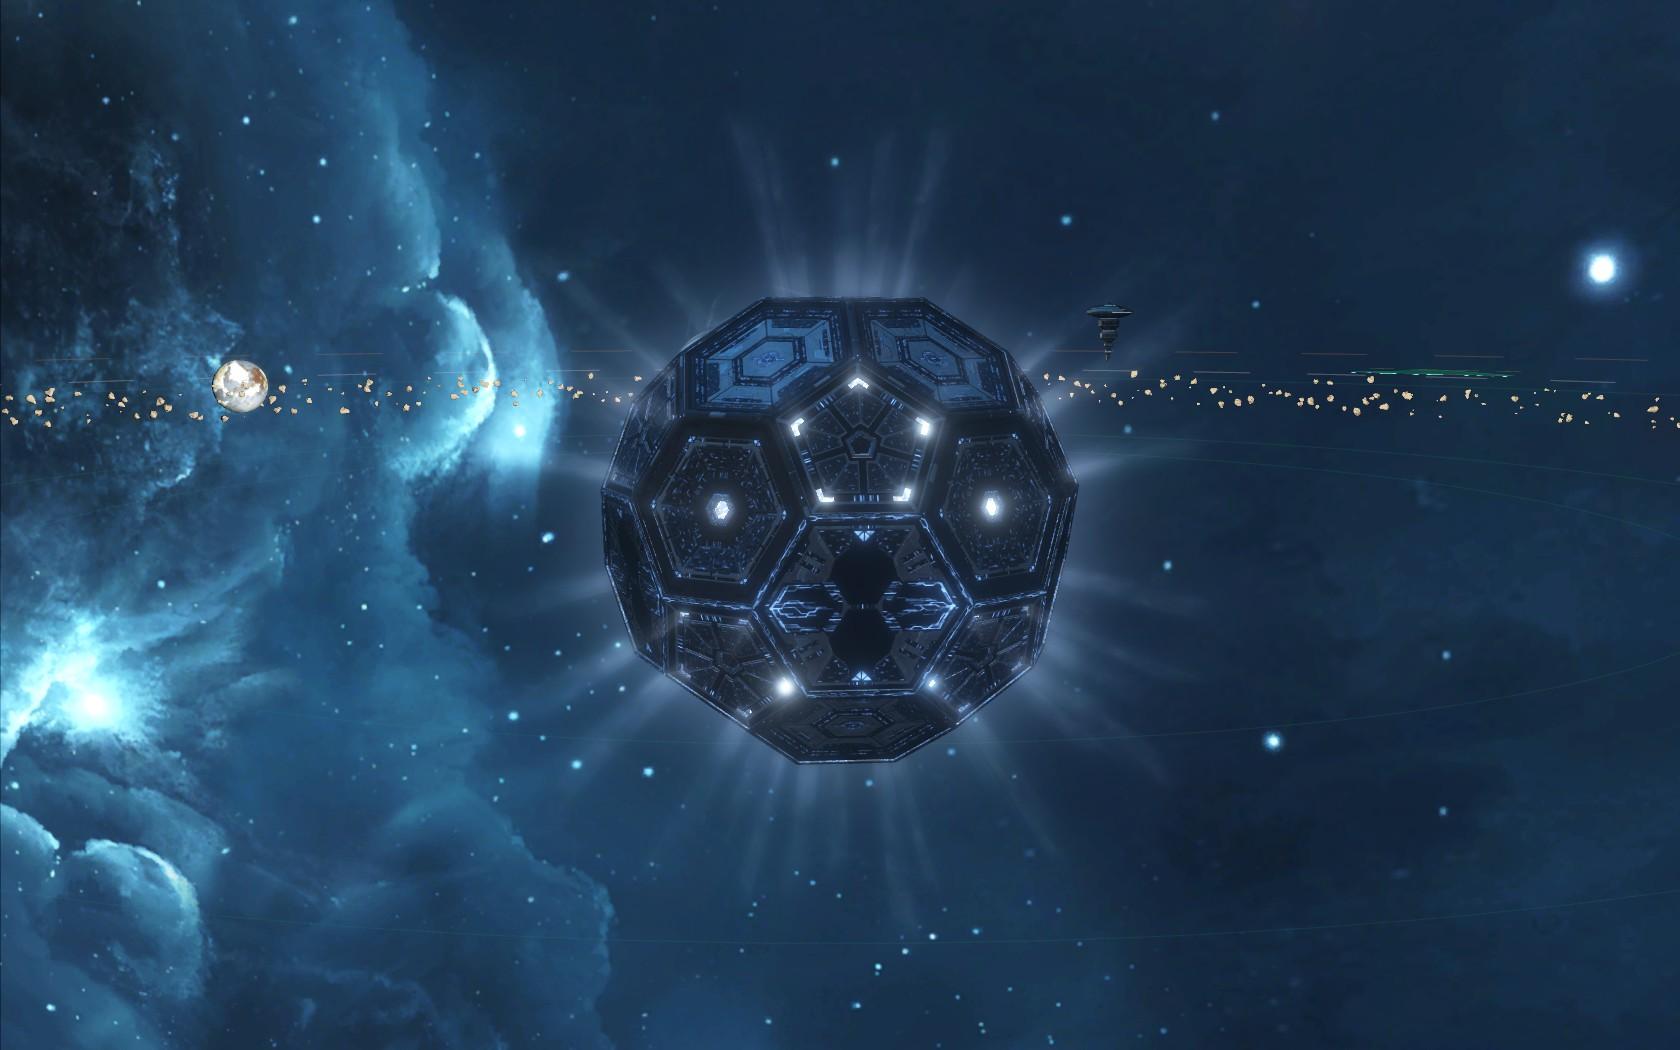 Dyson sphere stellaris пылесос dyson для автомобиля